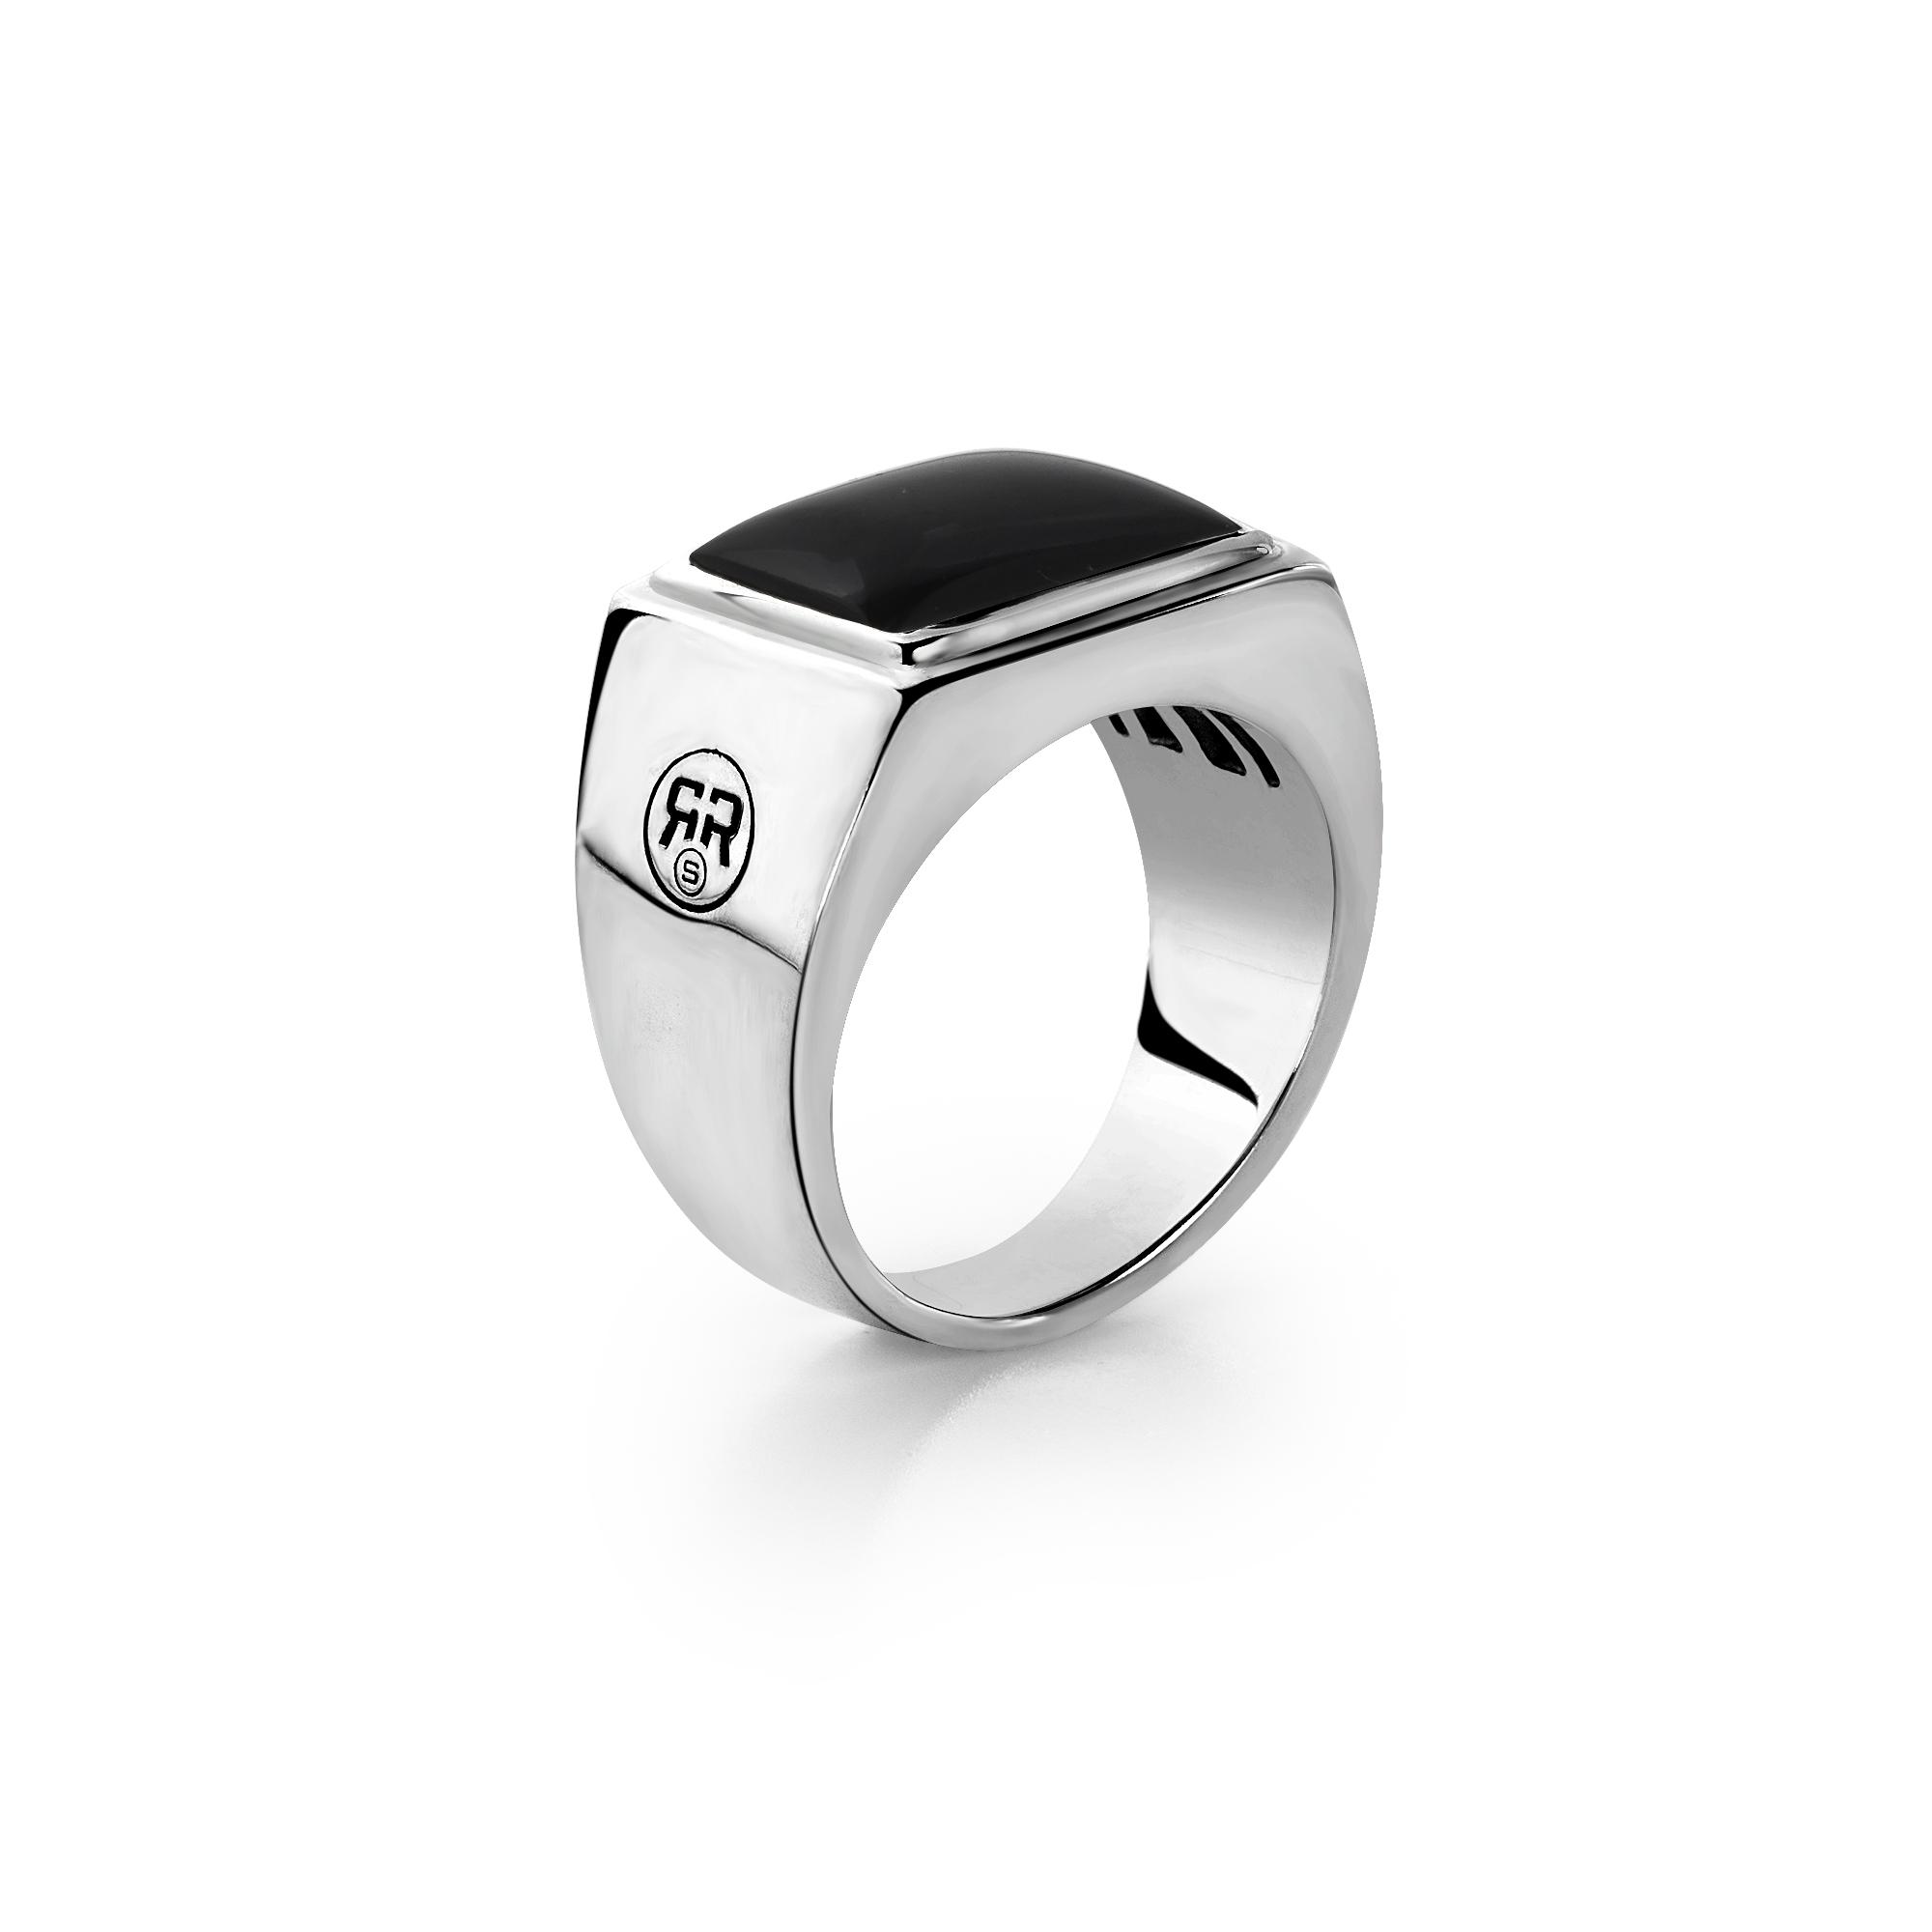 Rebel and Rose RR RG004 S Ring Square Onyx zilver zwart Maat 63